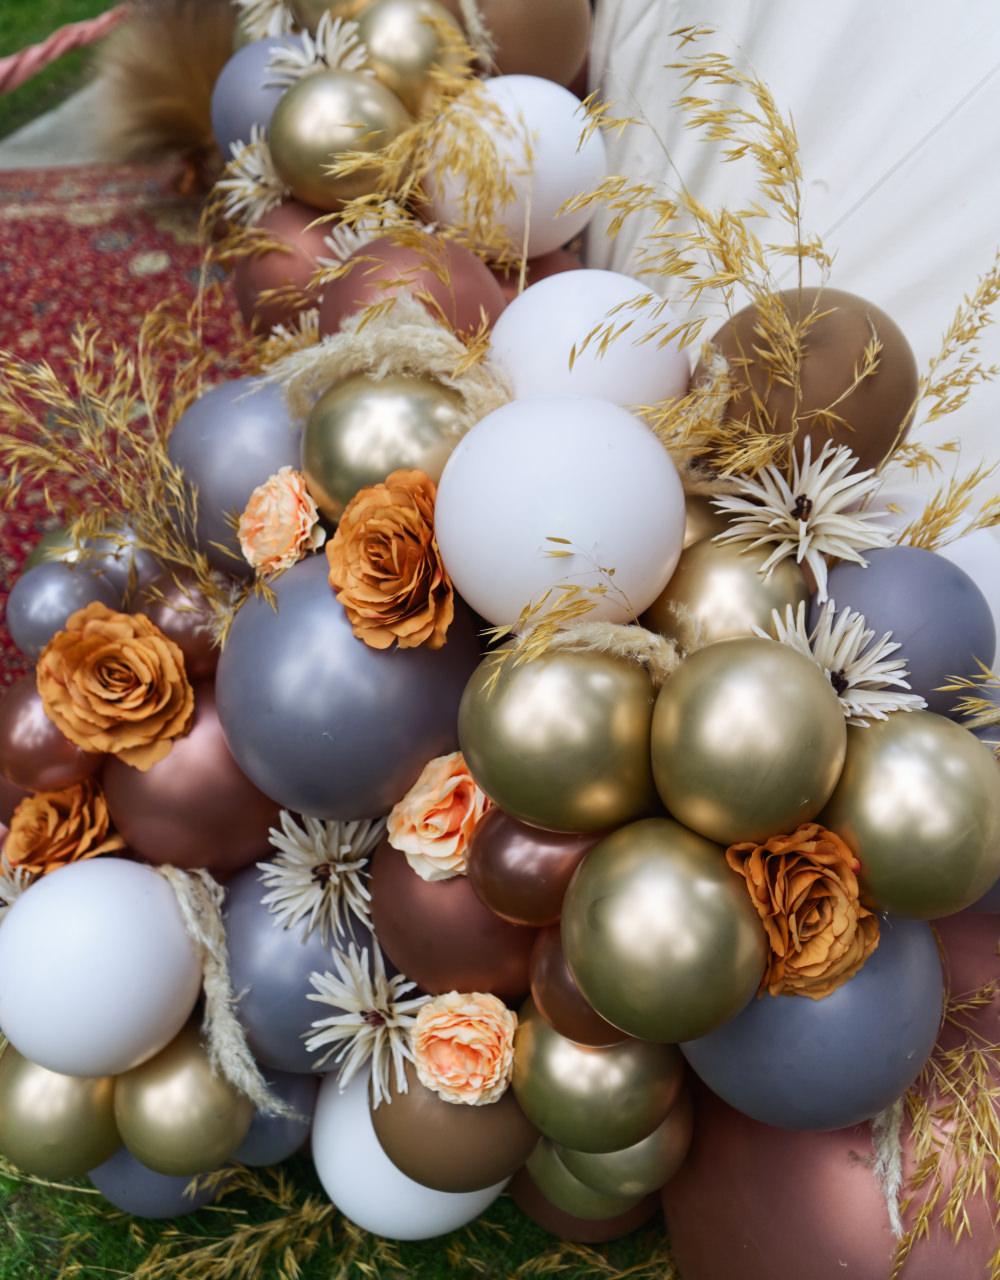 Balloons Balloon Installation Flowers Grass Gold Grey Moroccan Wedding Inspiration Luke Batchelor Productions